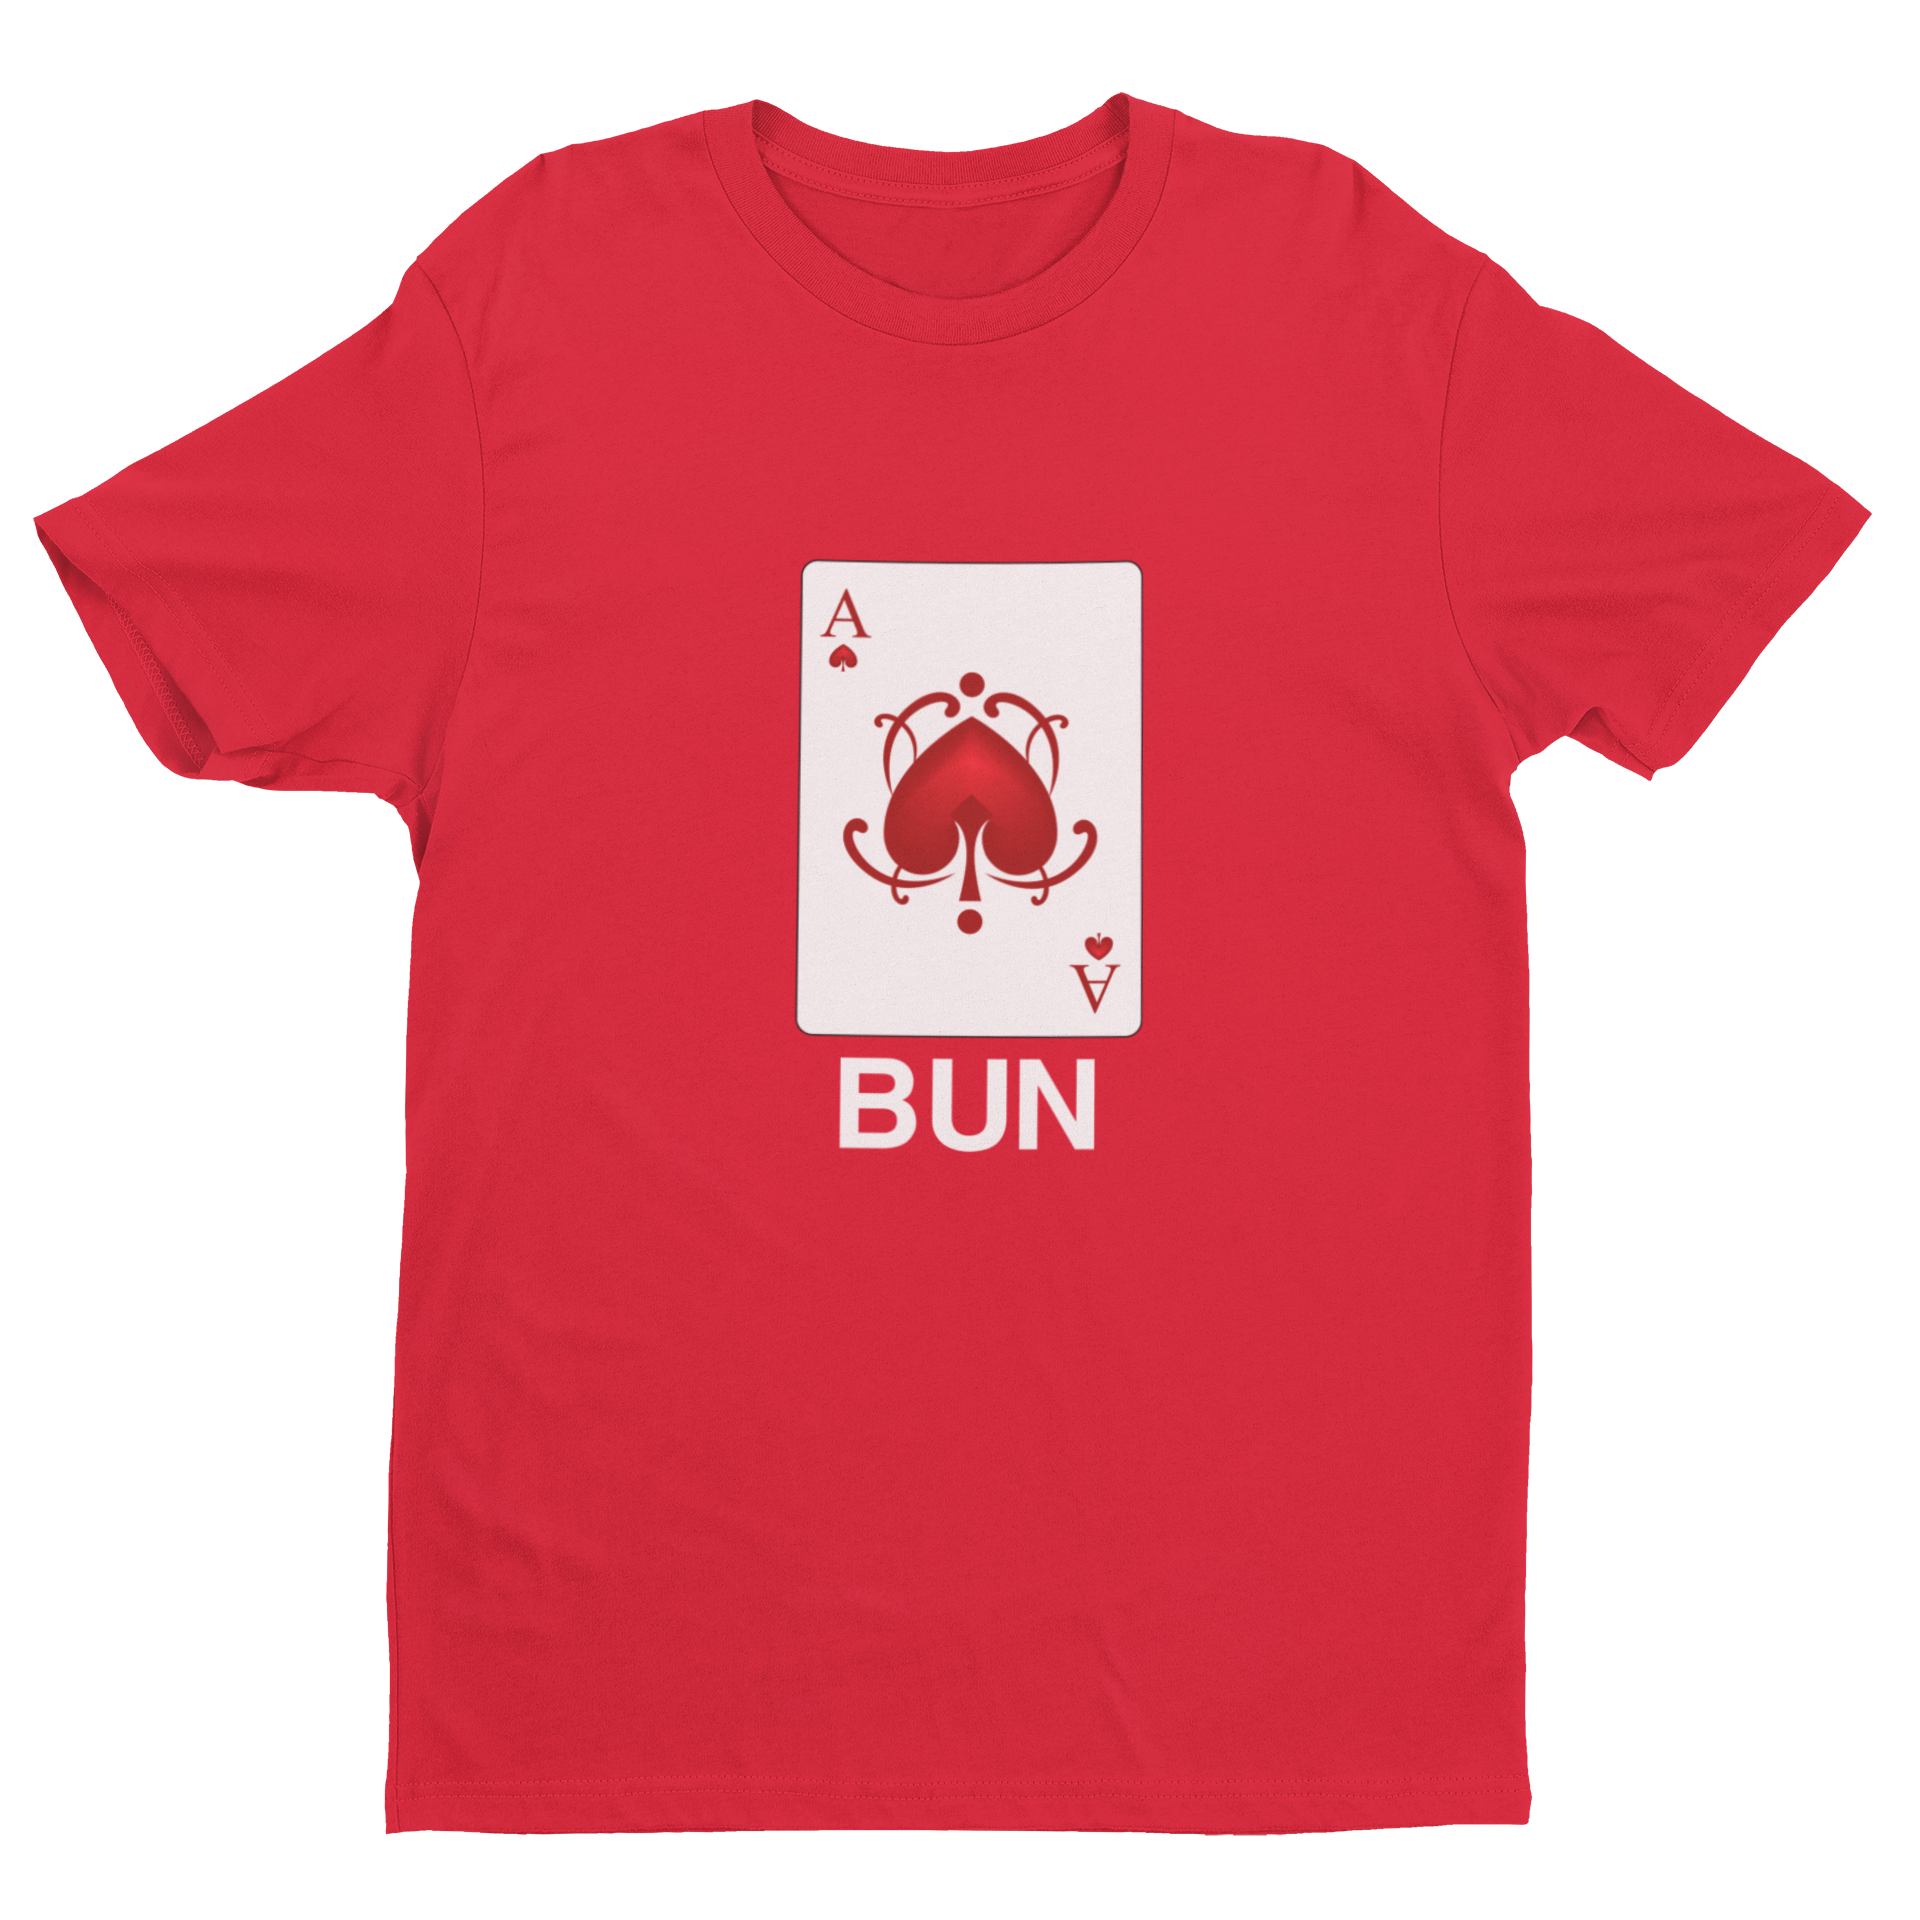 Bun (Ace) Crew Neck S-Sleeve T-shirt